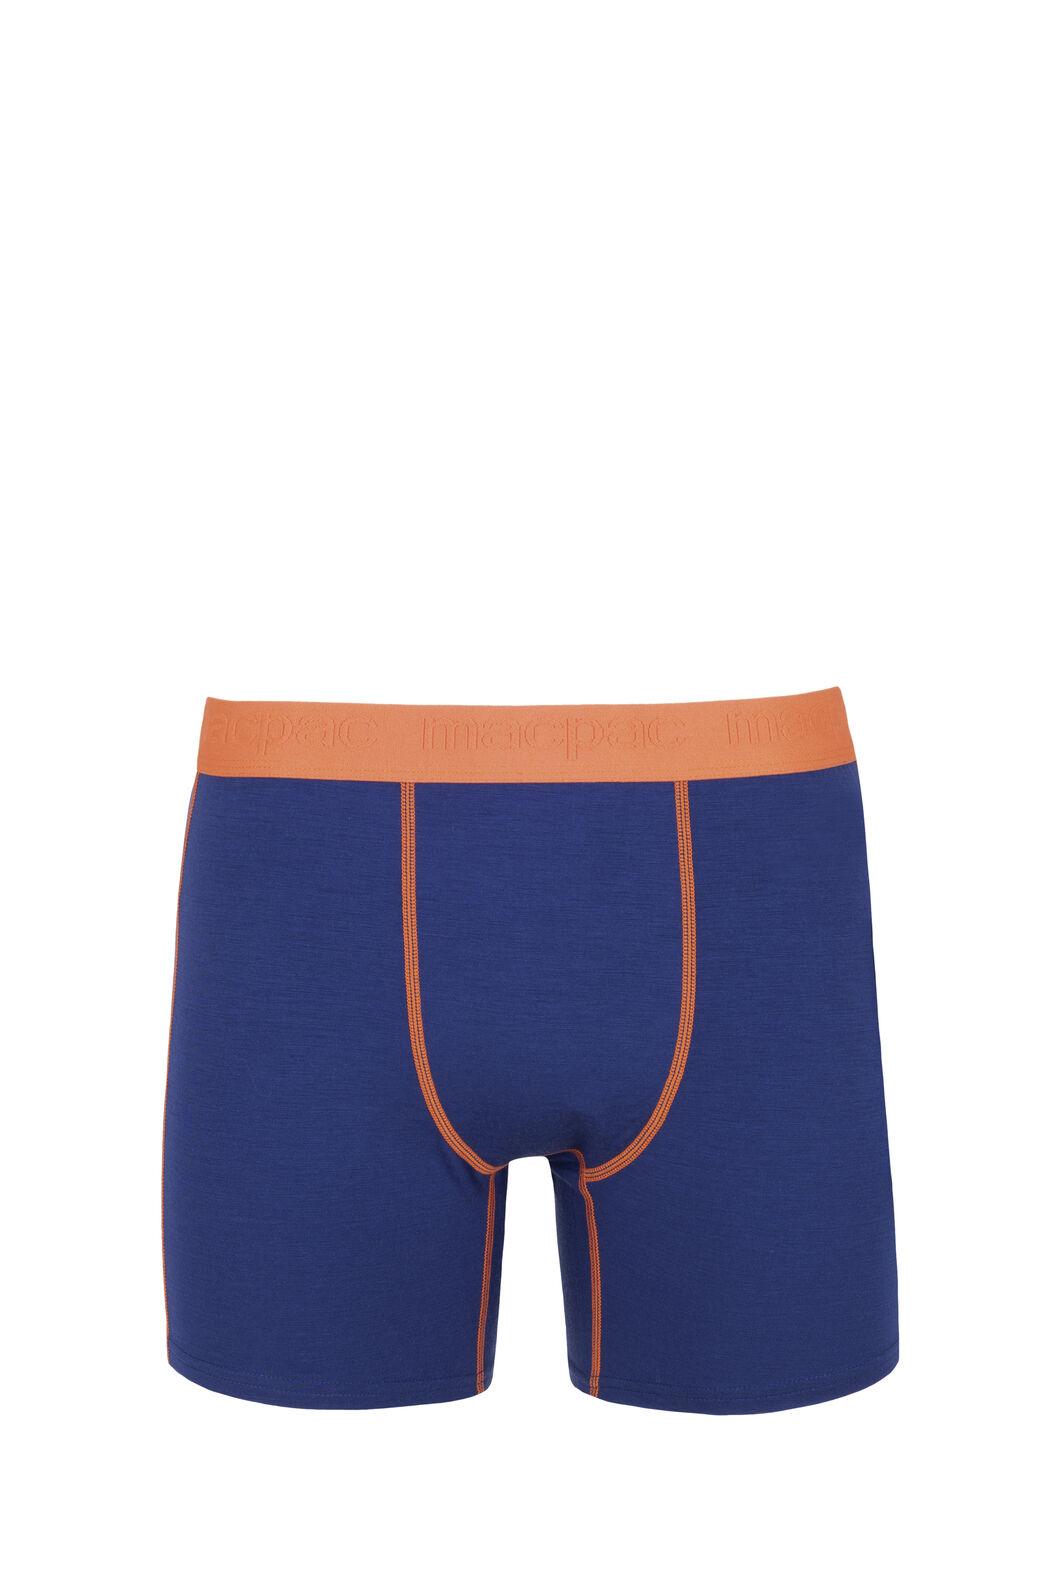 Macpac 180 Merino Boxers - Men's, Blue Depths/Burnt Orange, hi-res